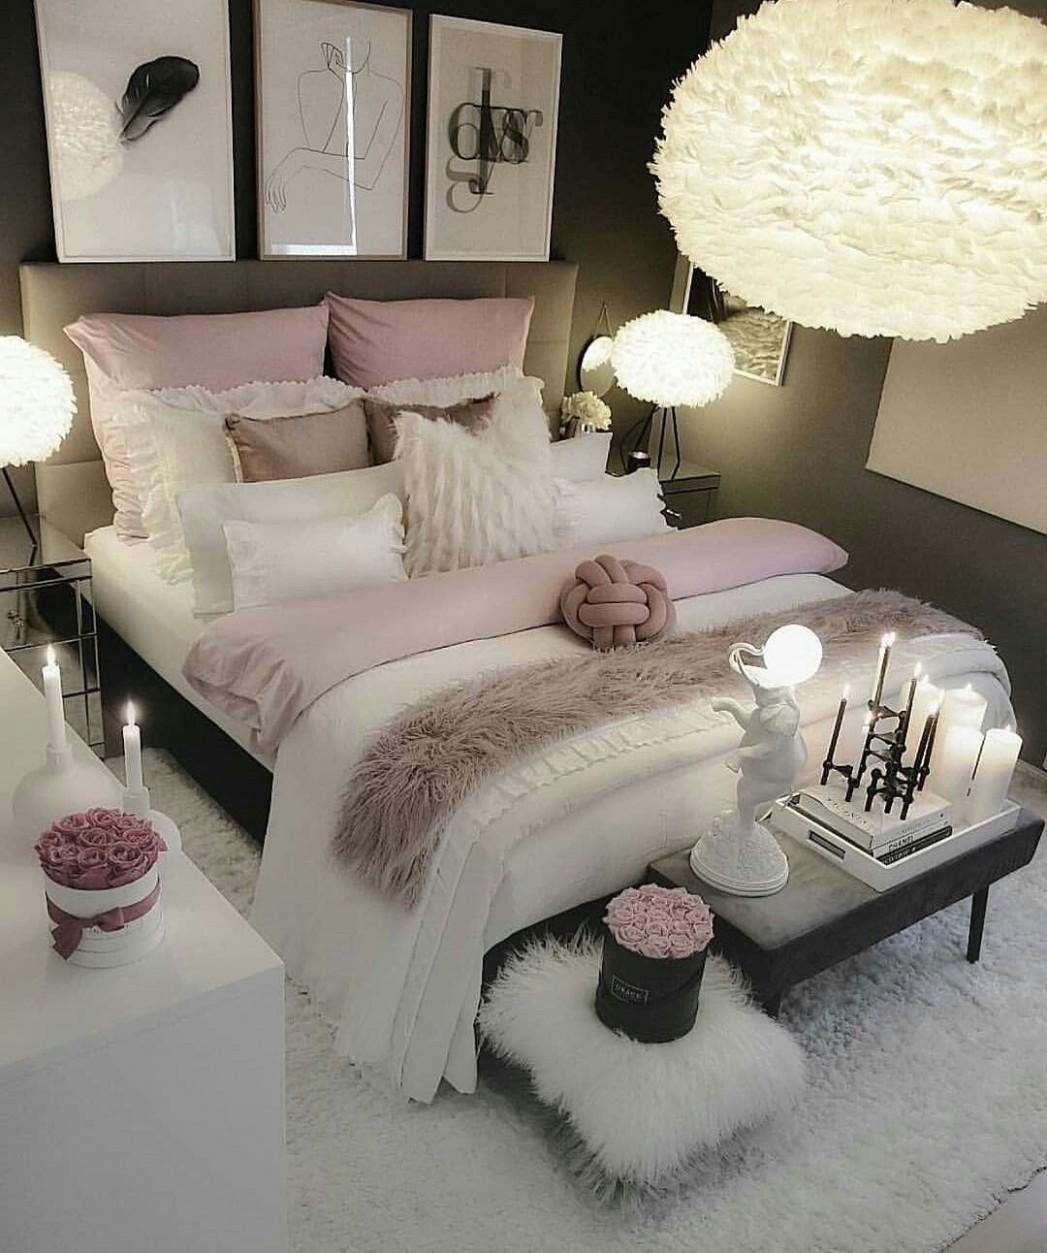 Bedroom Inspiration  Doses of Luxury #habitacion  Bedroom decor  - Bedroom Ideas Adults